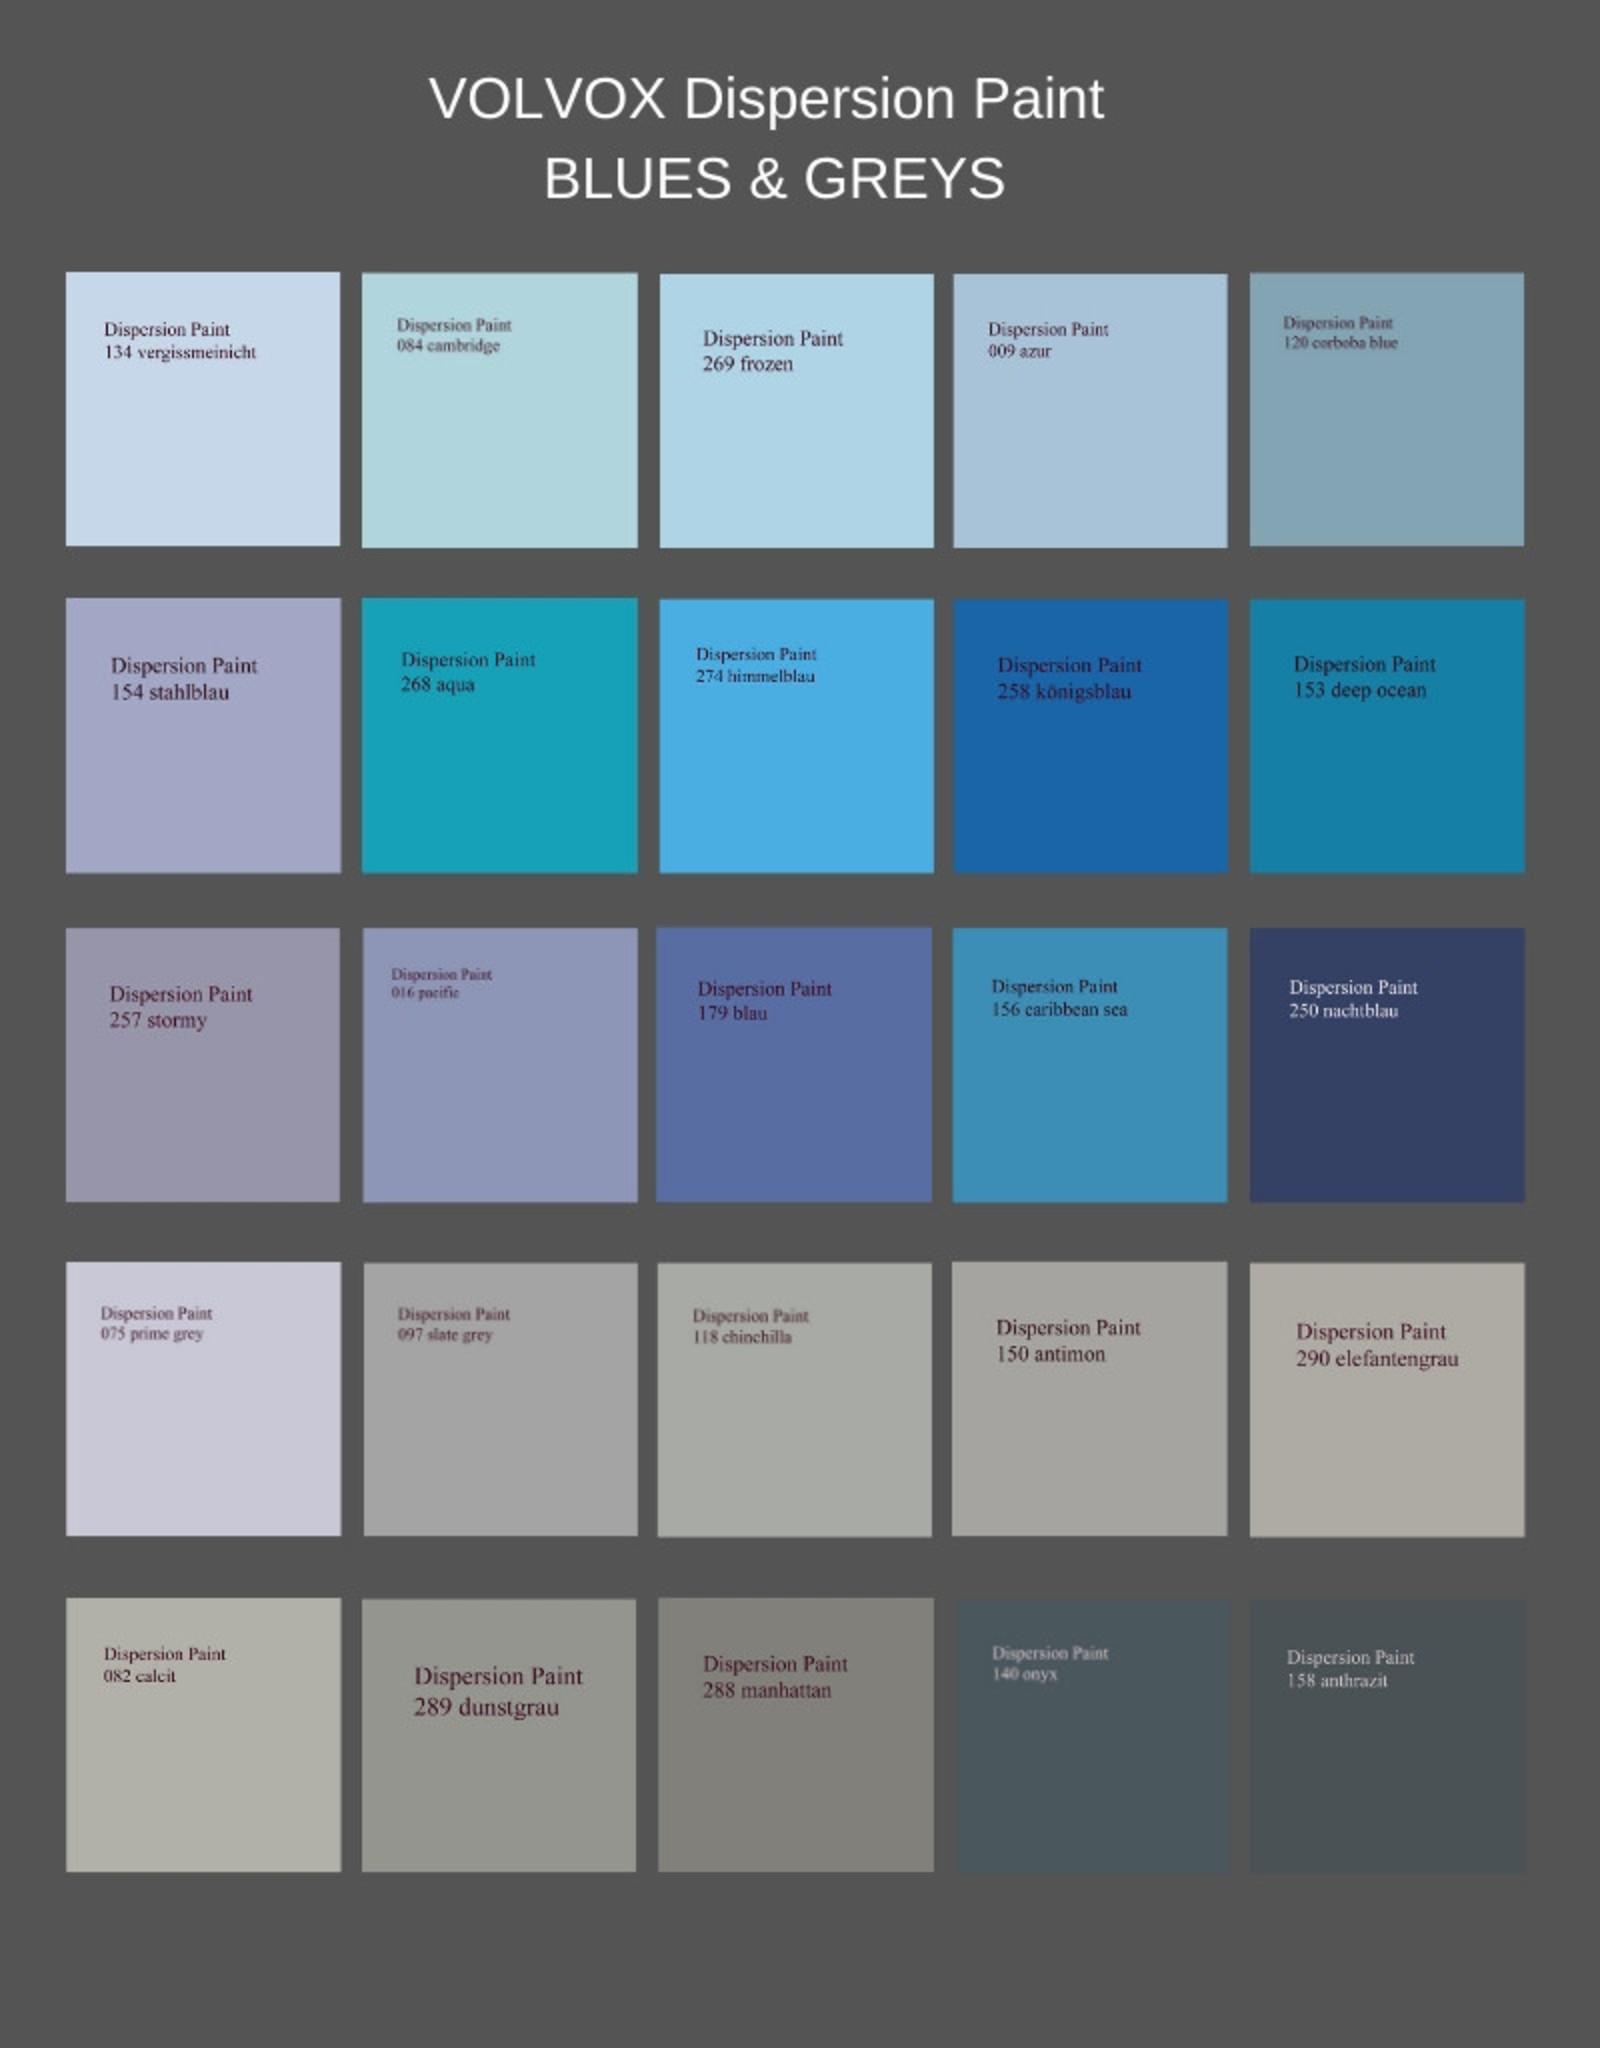 VOLVOX Dispersion Paint BLUES & GREYS